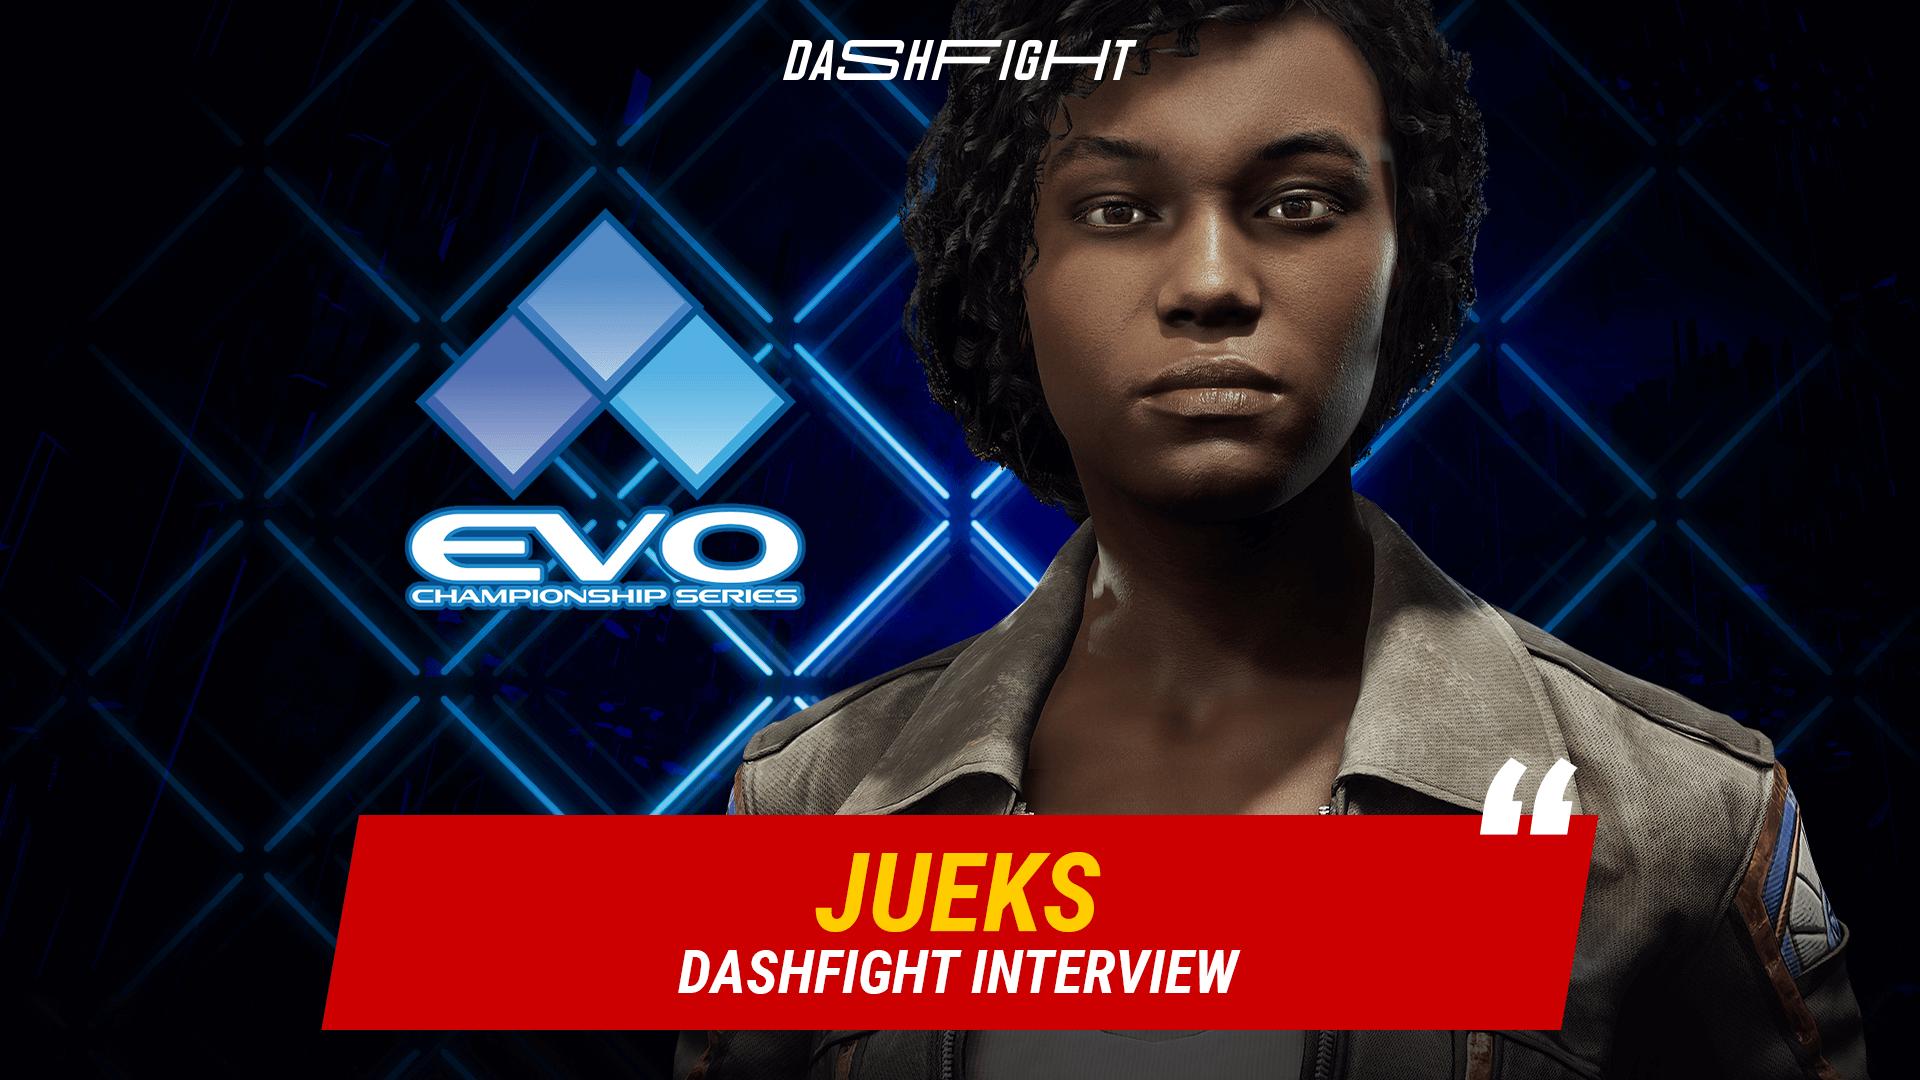 """Fighting NinjaKilla Is Like Facing a Robot""- Jueks Evo 2021 Interview"